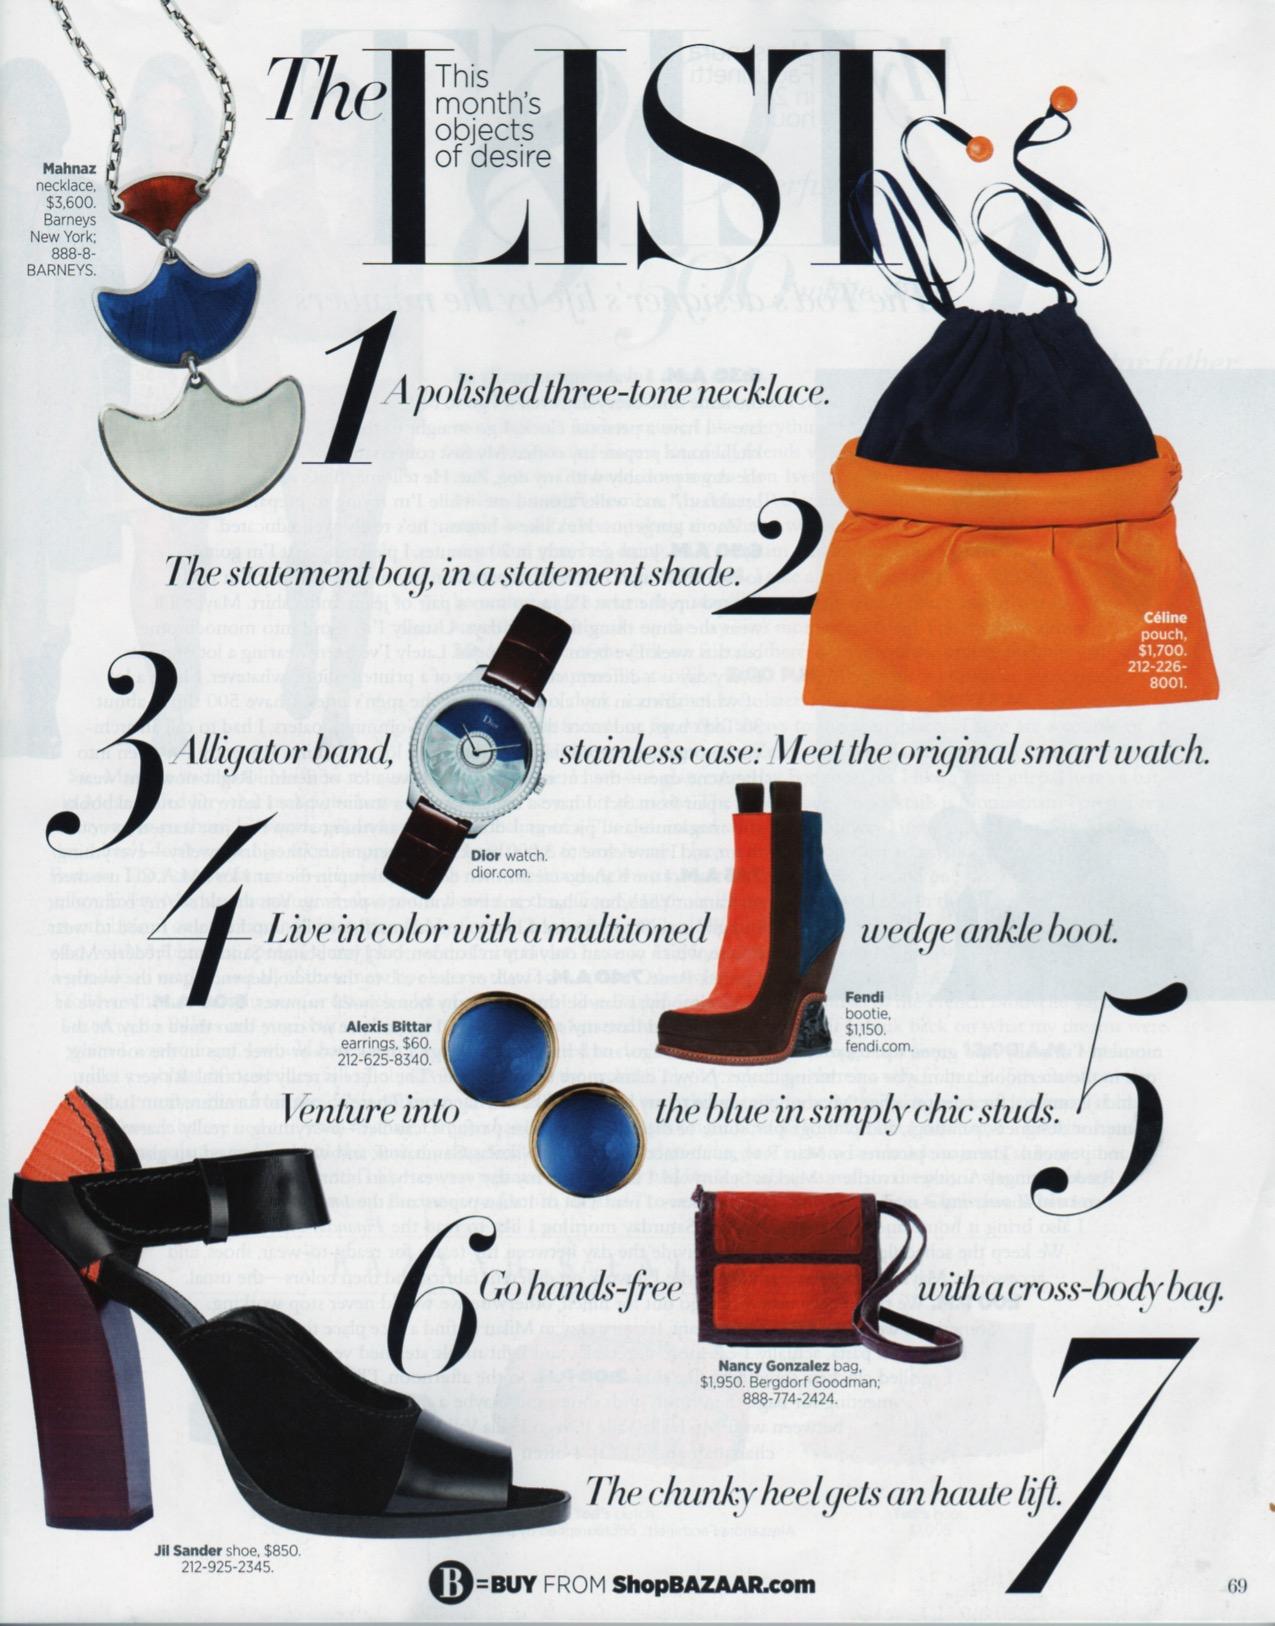 Harpers Bazaar August 2015 The List.jpeg